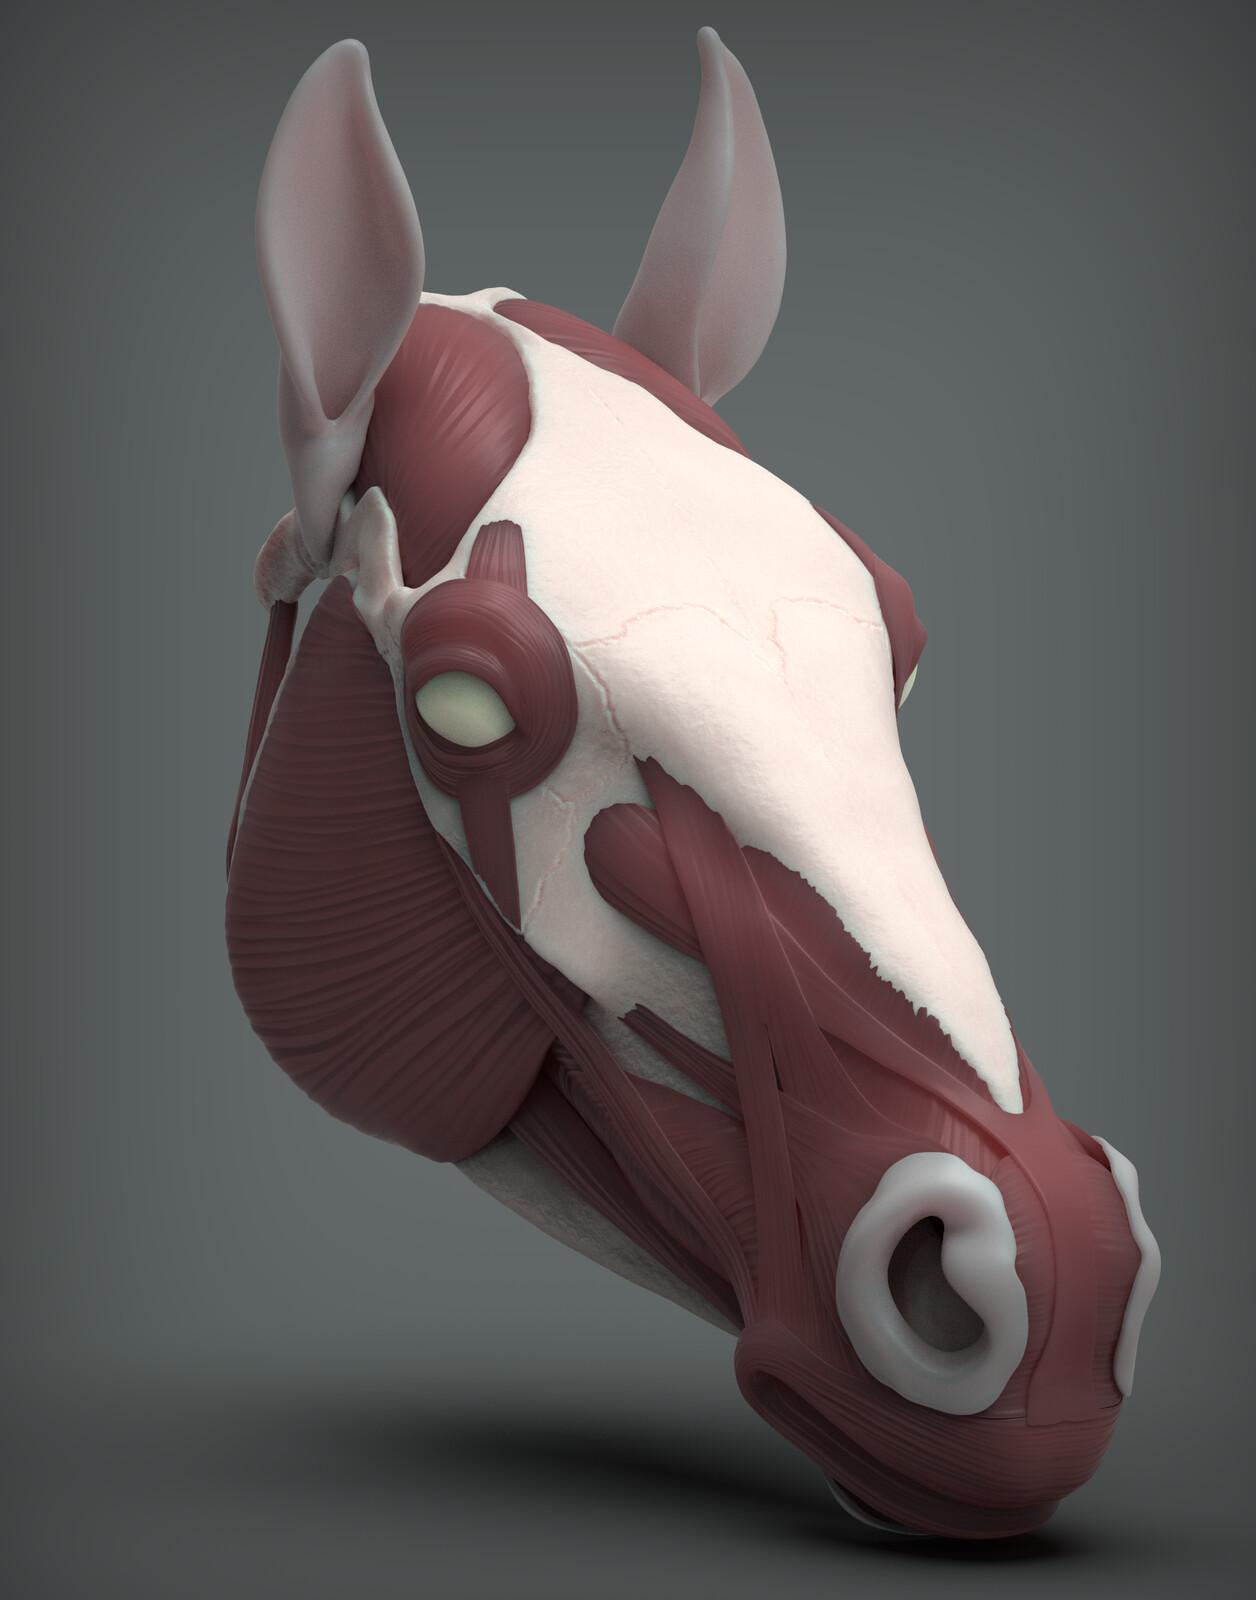 Horse Face Anatomy Study